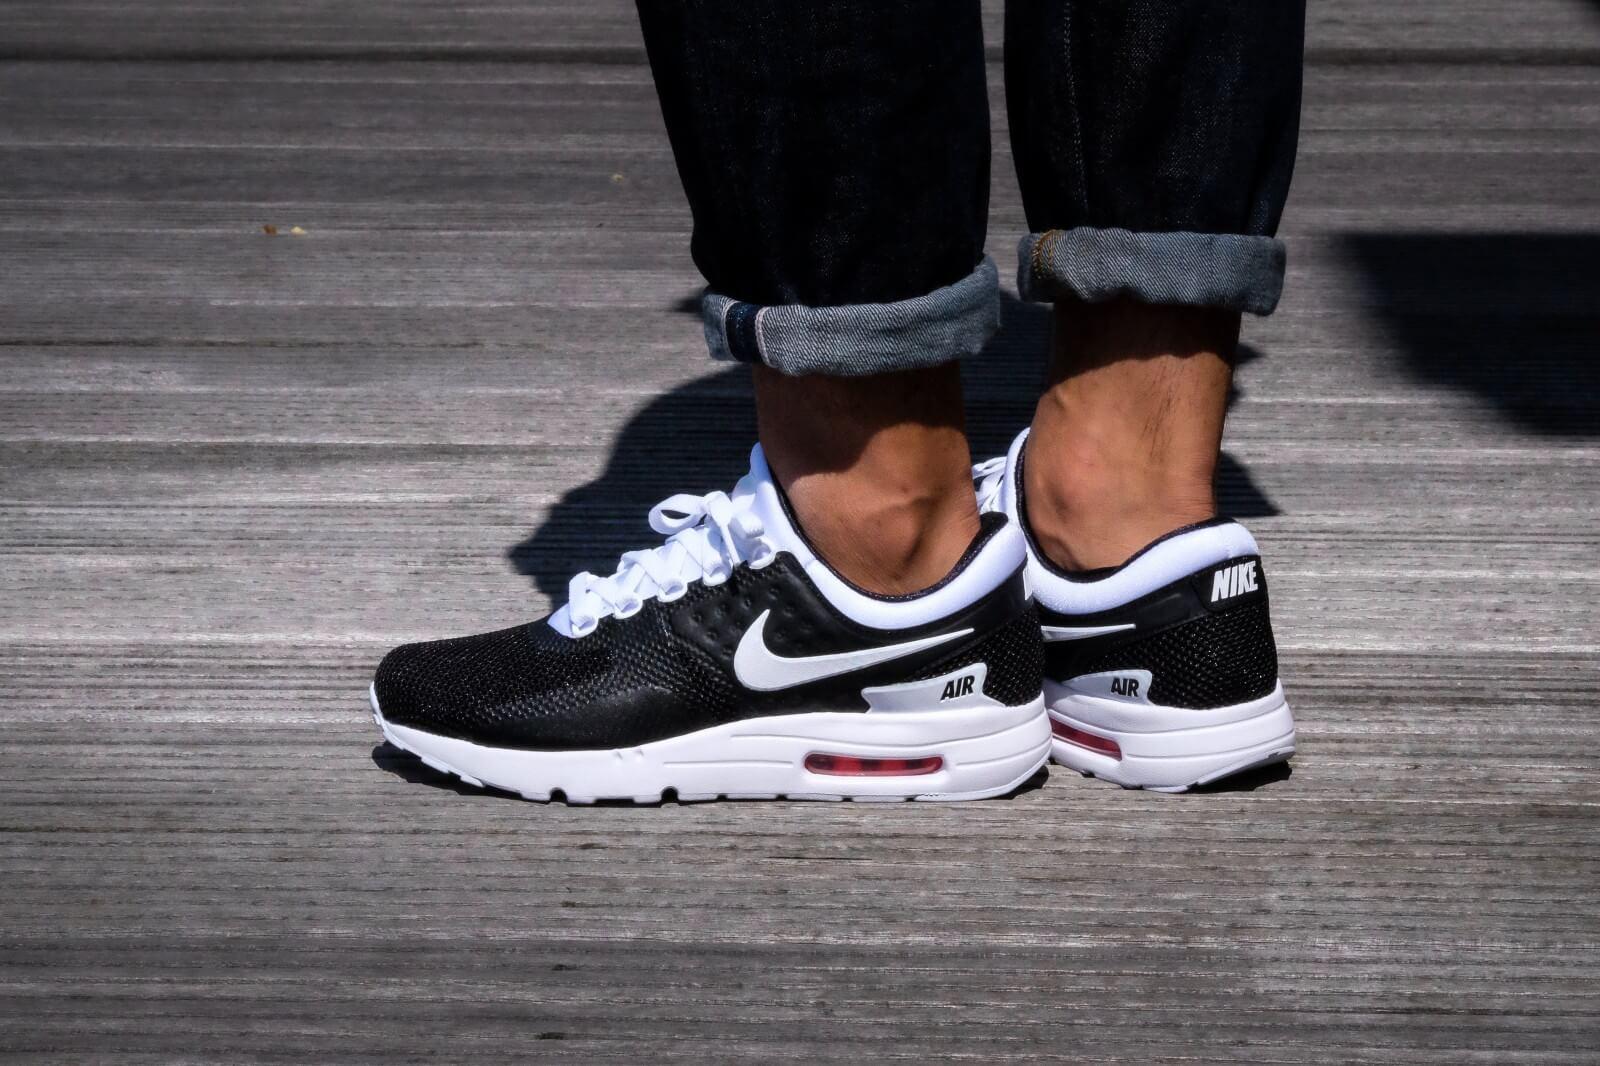 Men's Cheap Nike Air Max Zero Black Red Casual u]RLQ6 Shoes